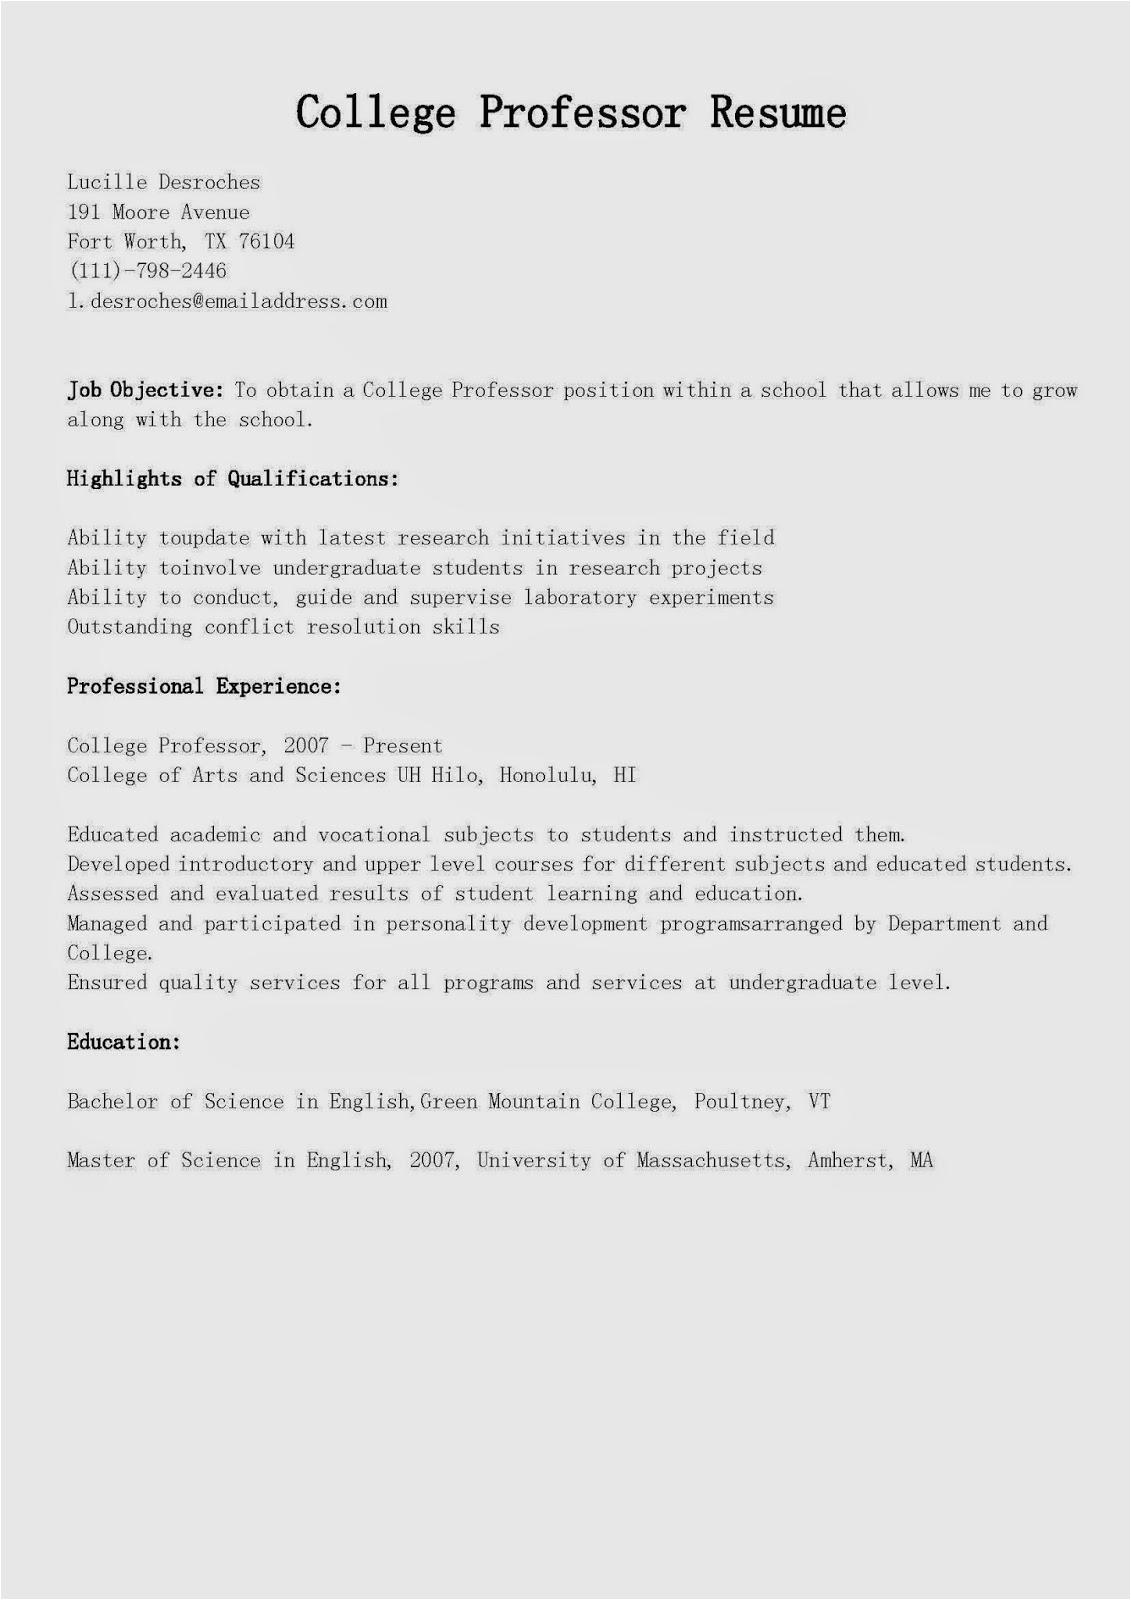 college professor resume sample